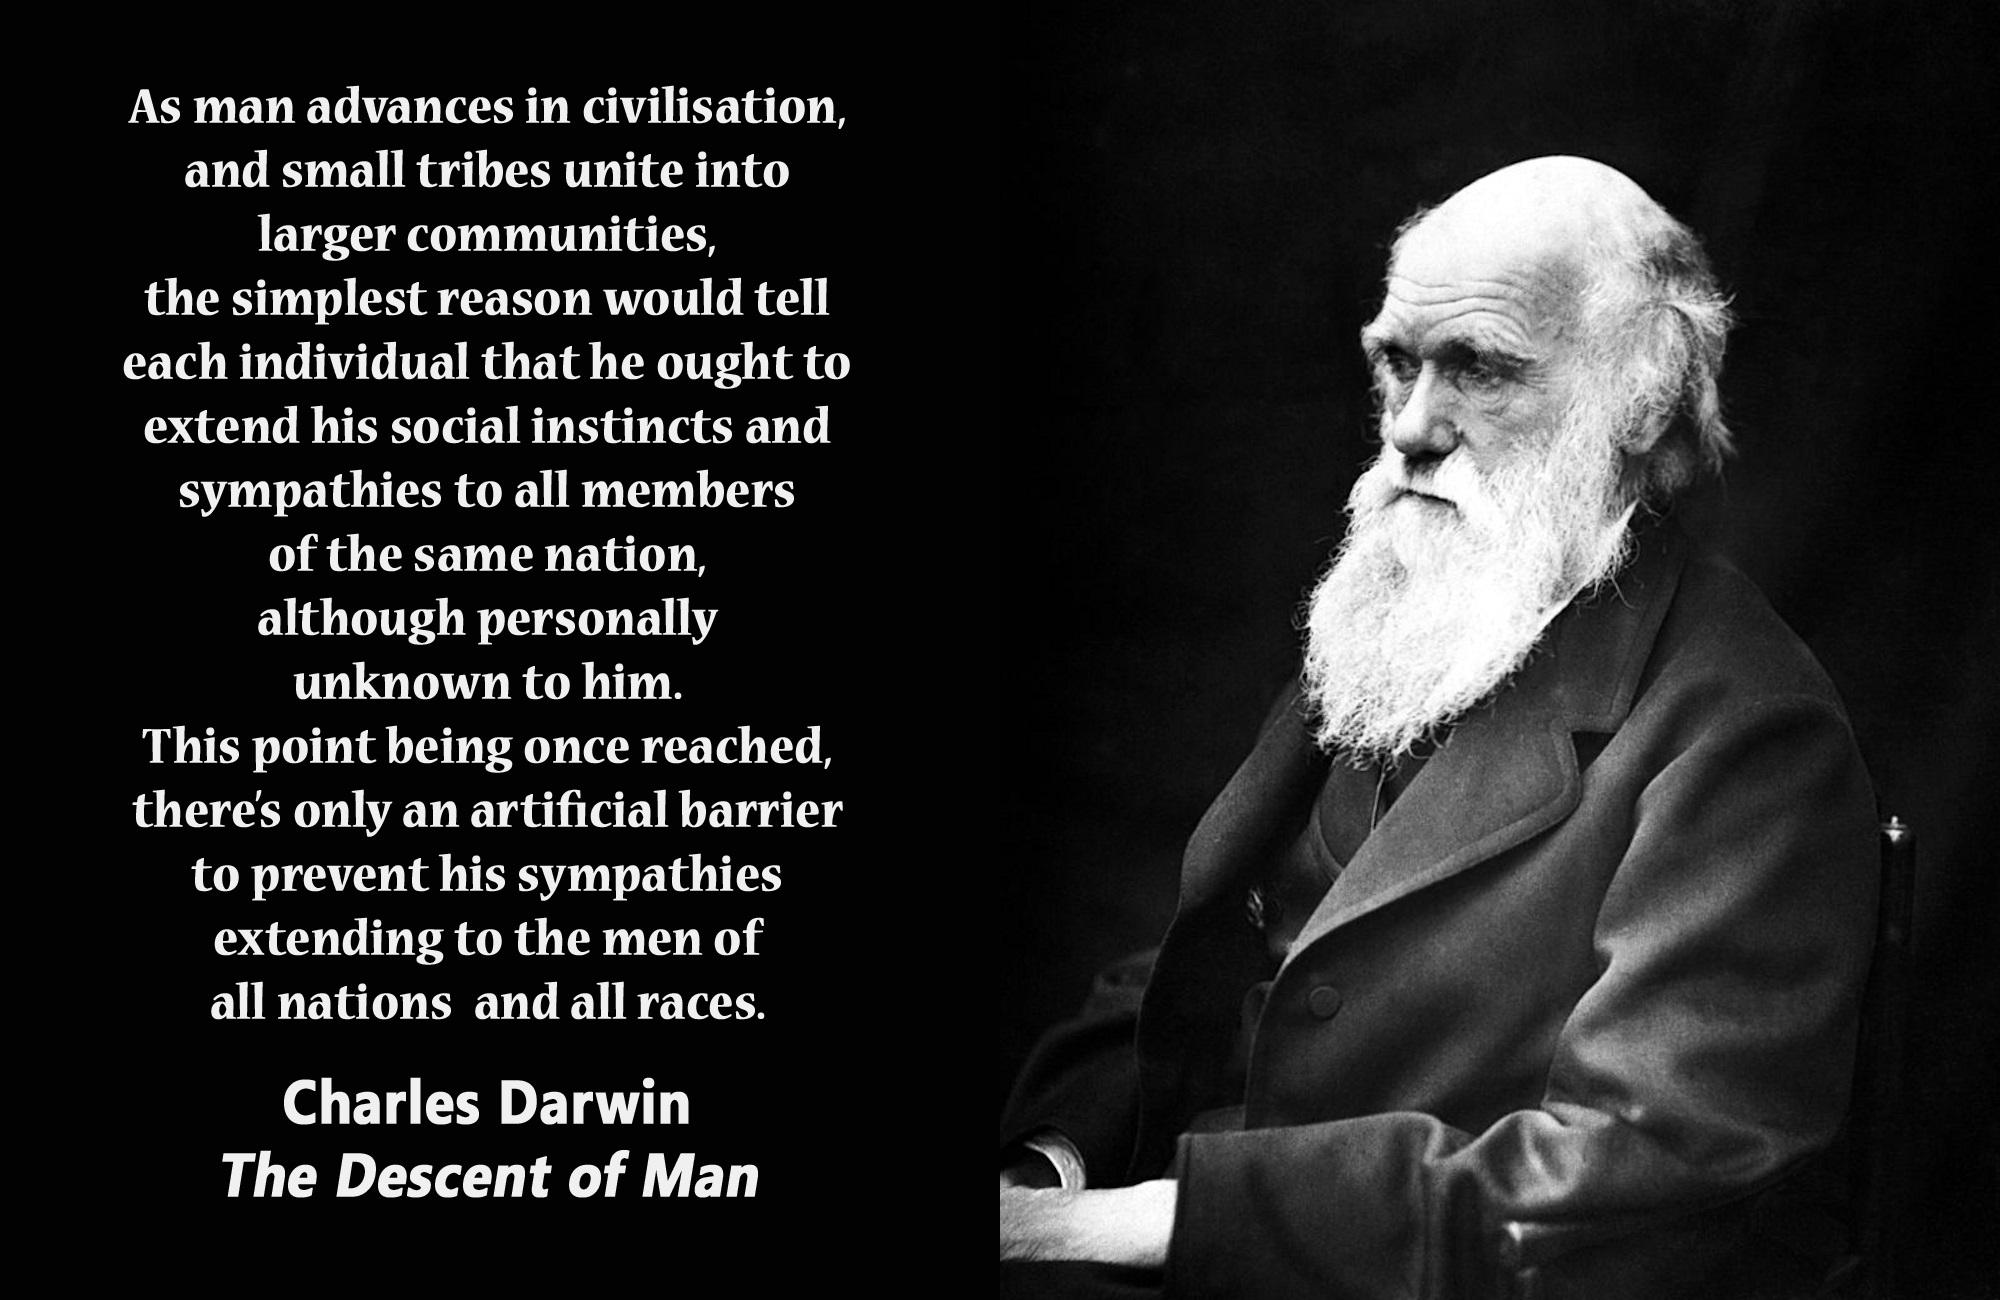 00 Charles Darwin humanity 210418